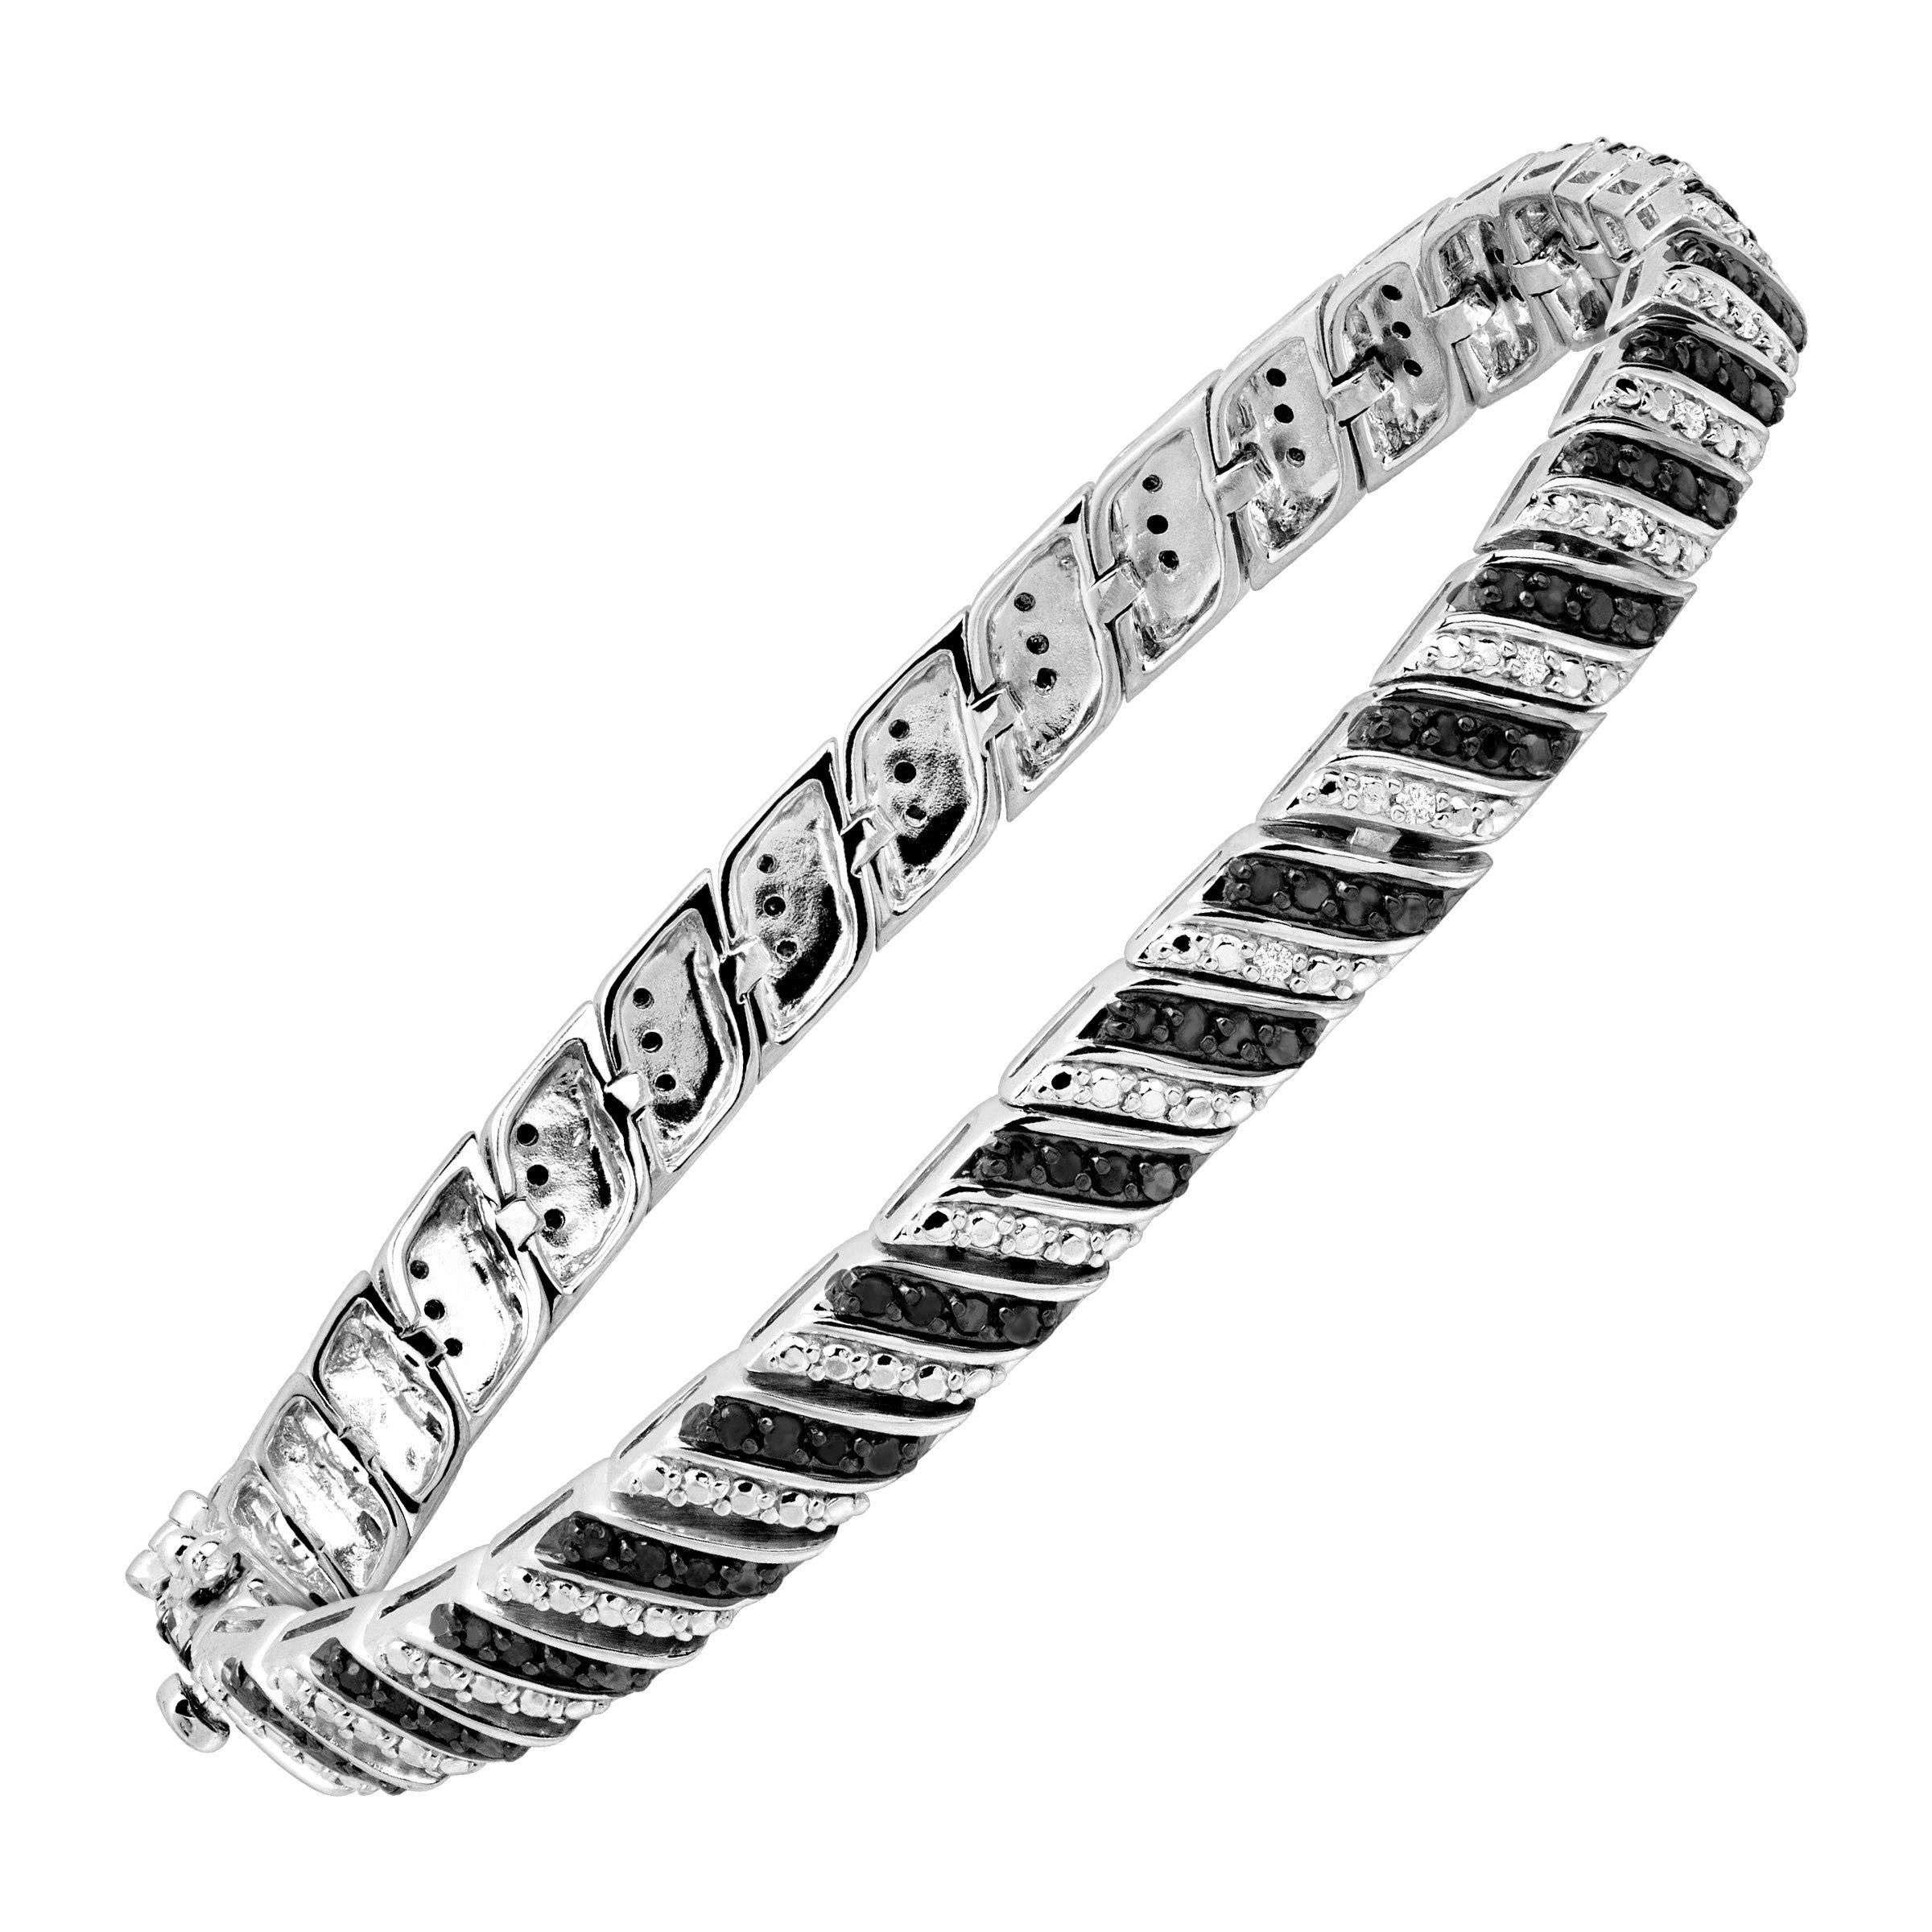 1 ct Black & White Diamond Tennis Bracelet in Sterling Silver by Finecraft